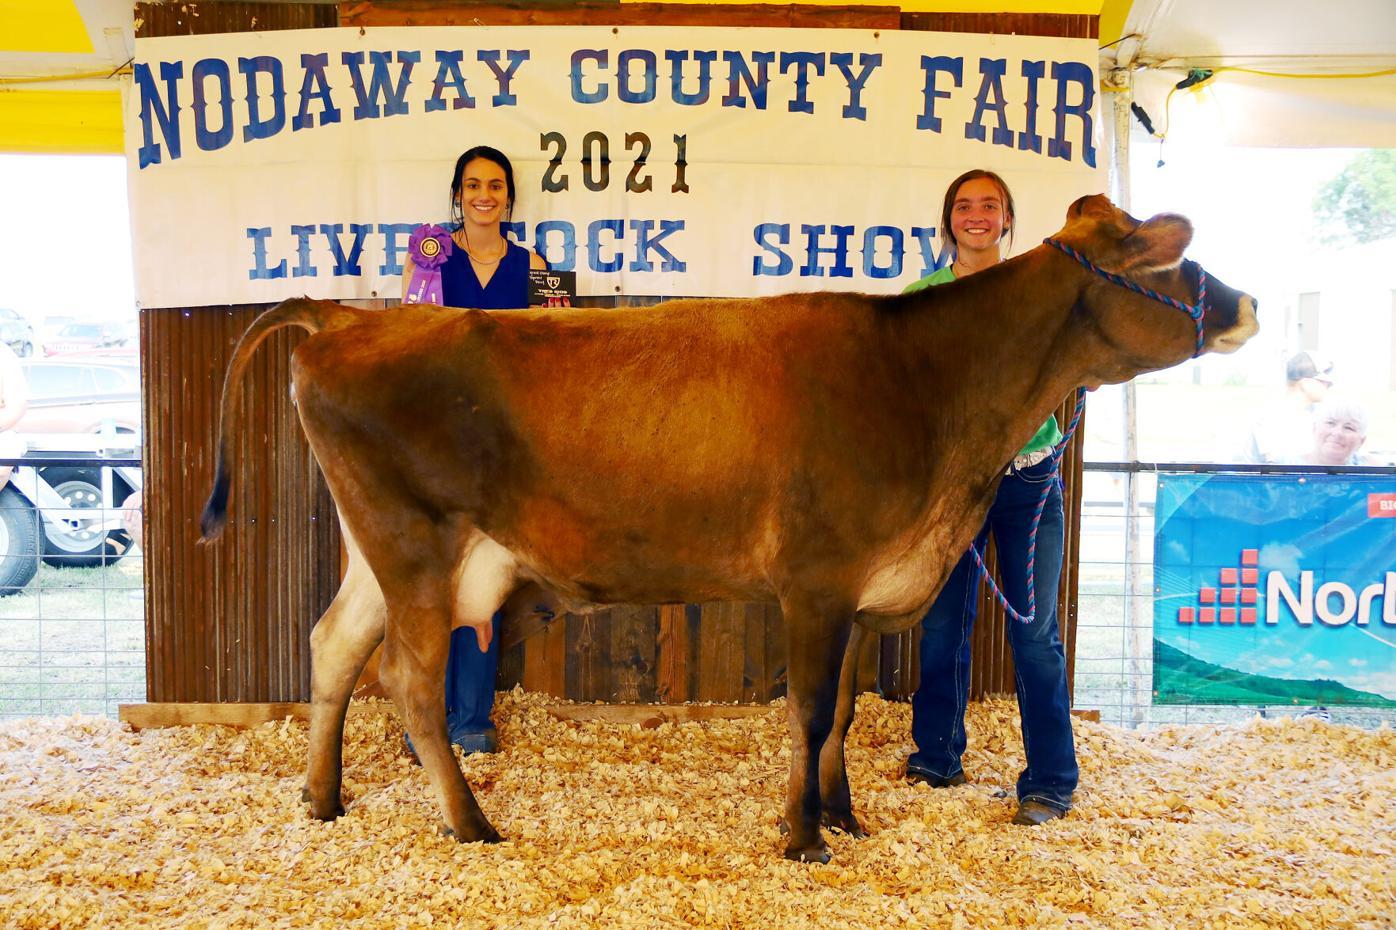 7-15-21 LS - Beef 3 - Grand Champ Supreme Dairy - Sarah Langford.jpg